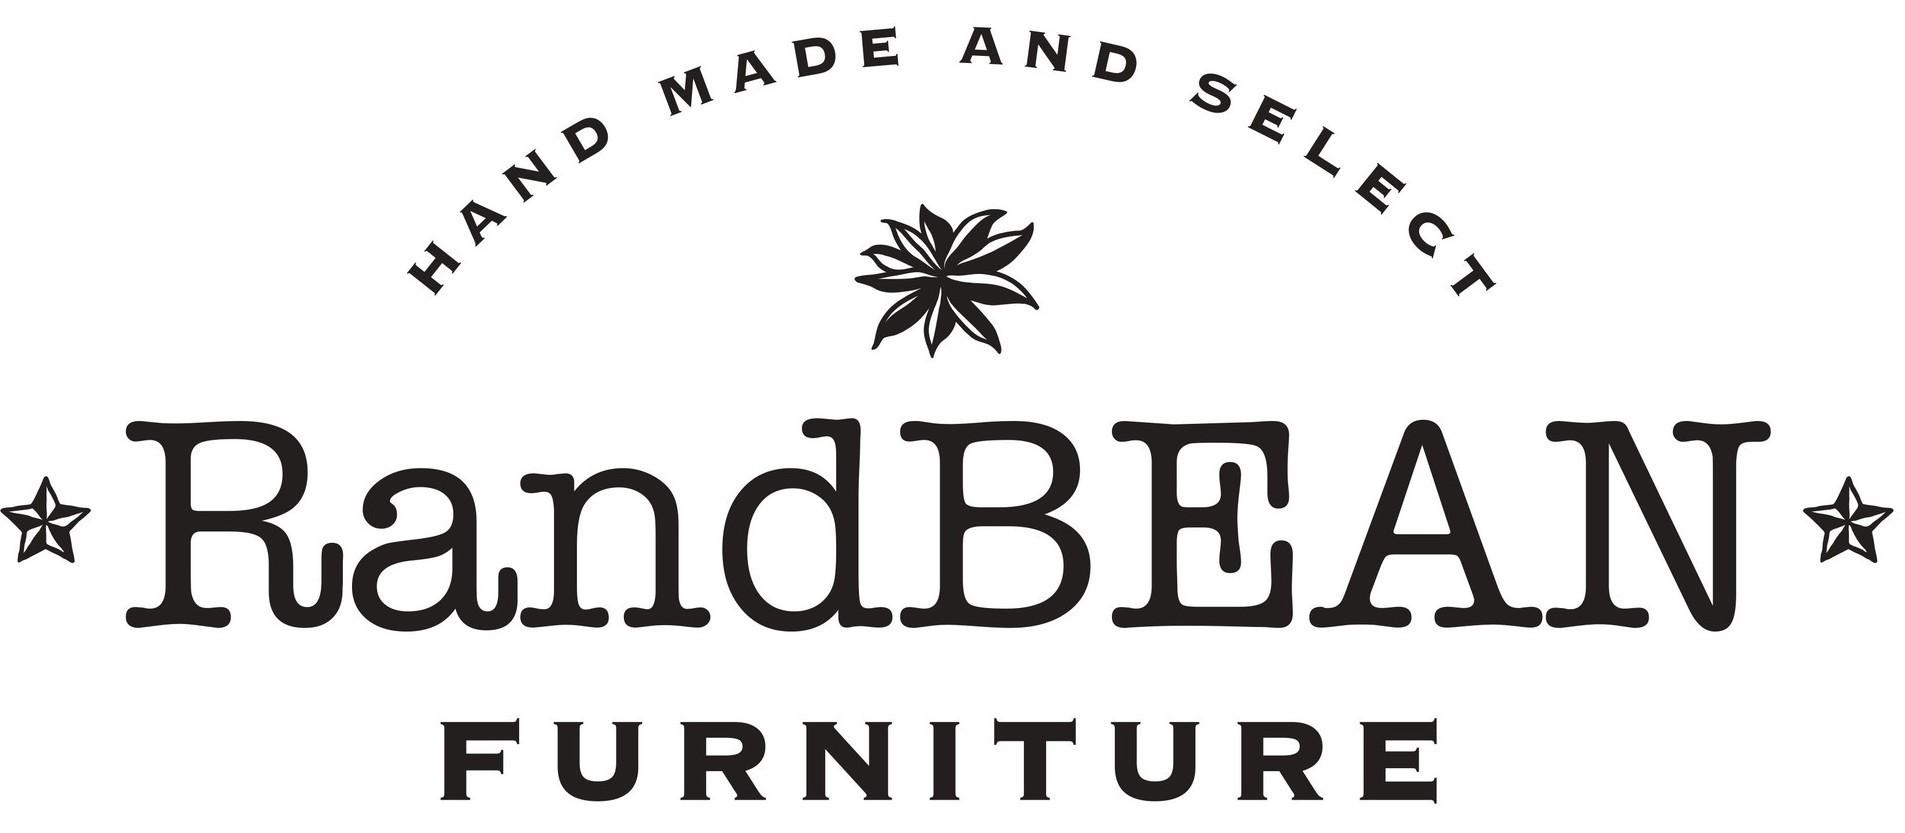 Rand BEAN オリジナル家具 カリモク crashgate idee NychairX ACME 古材